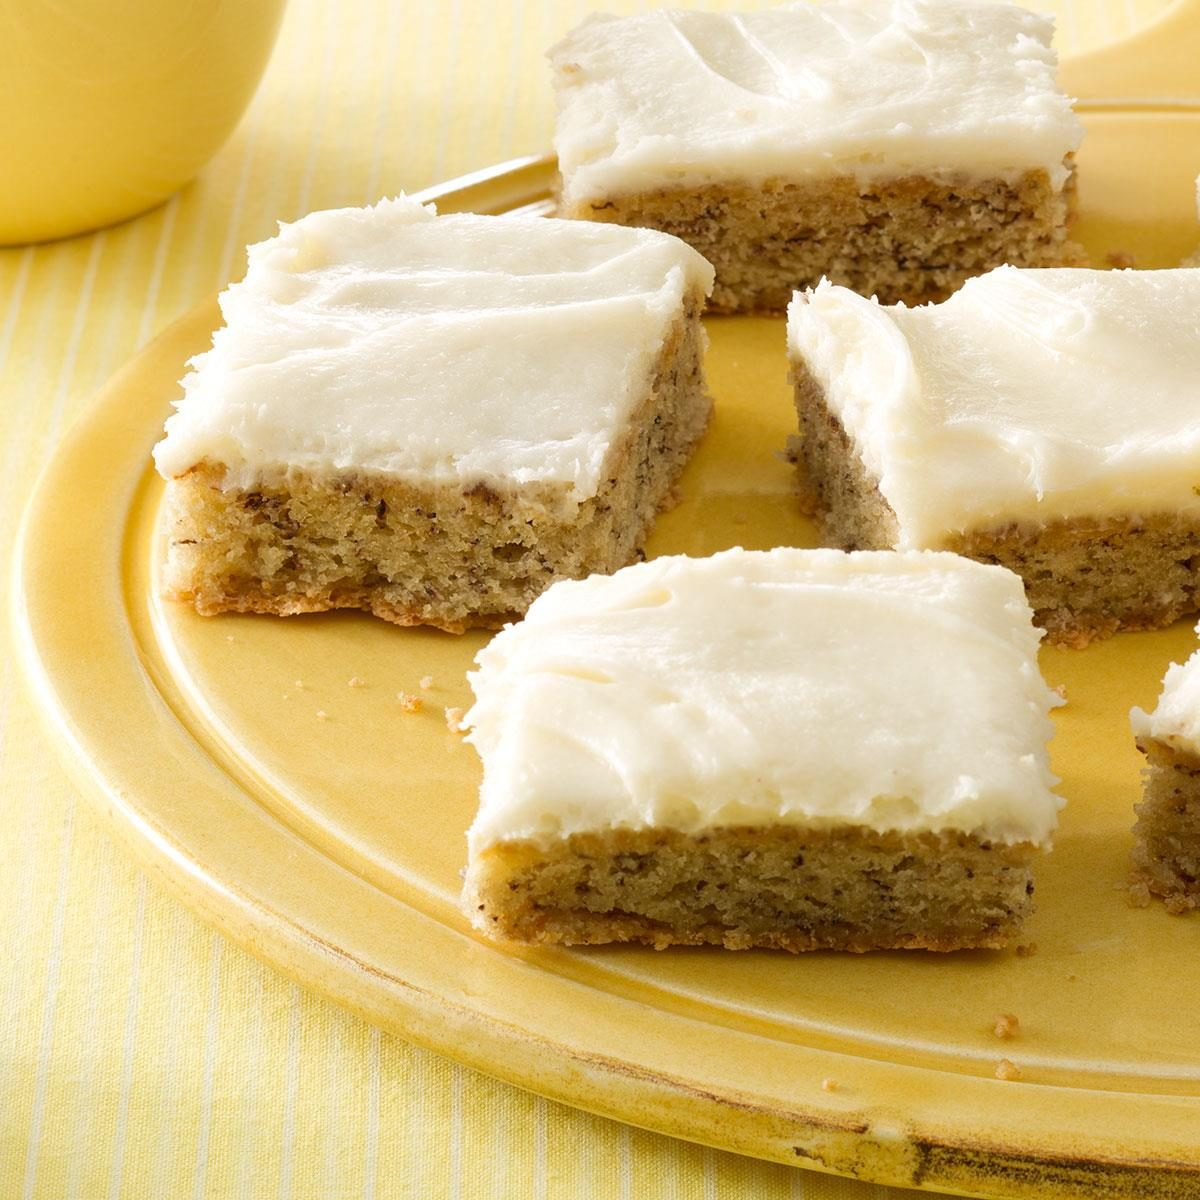 Taste Of Home Italian Cream Cake